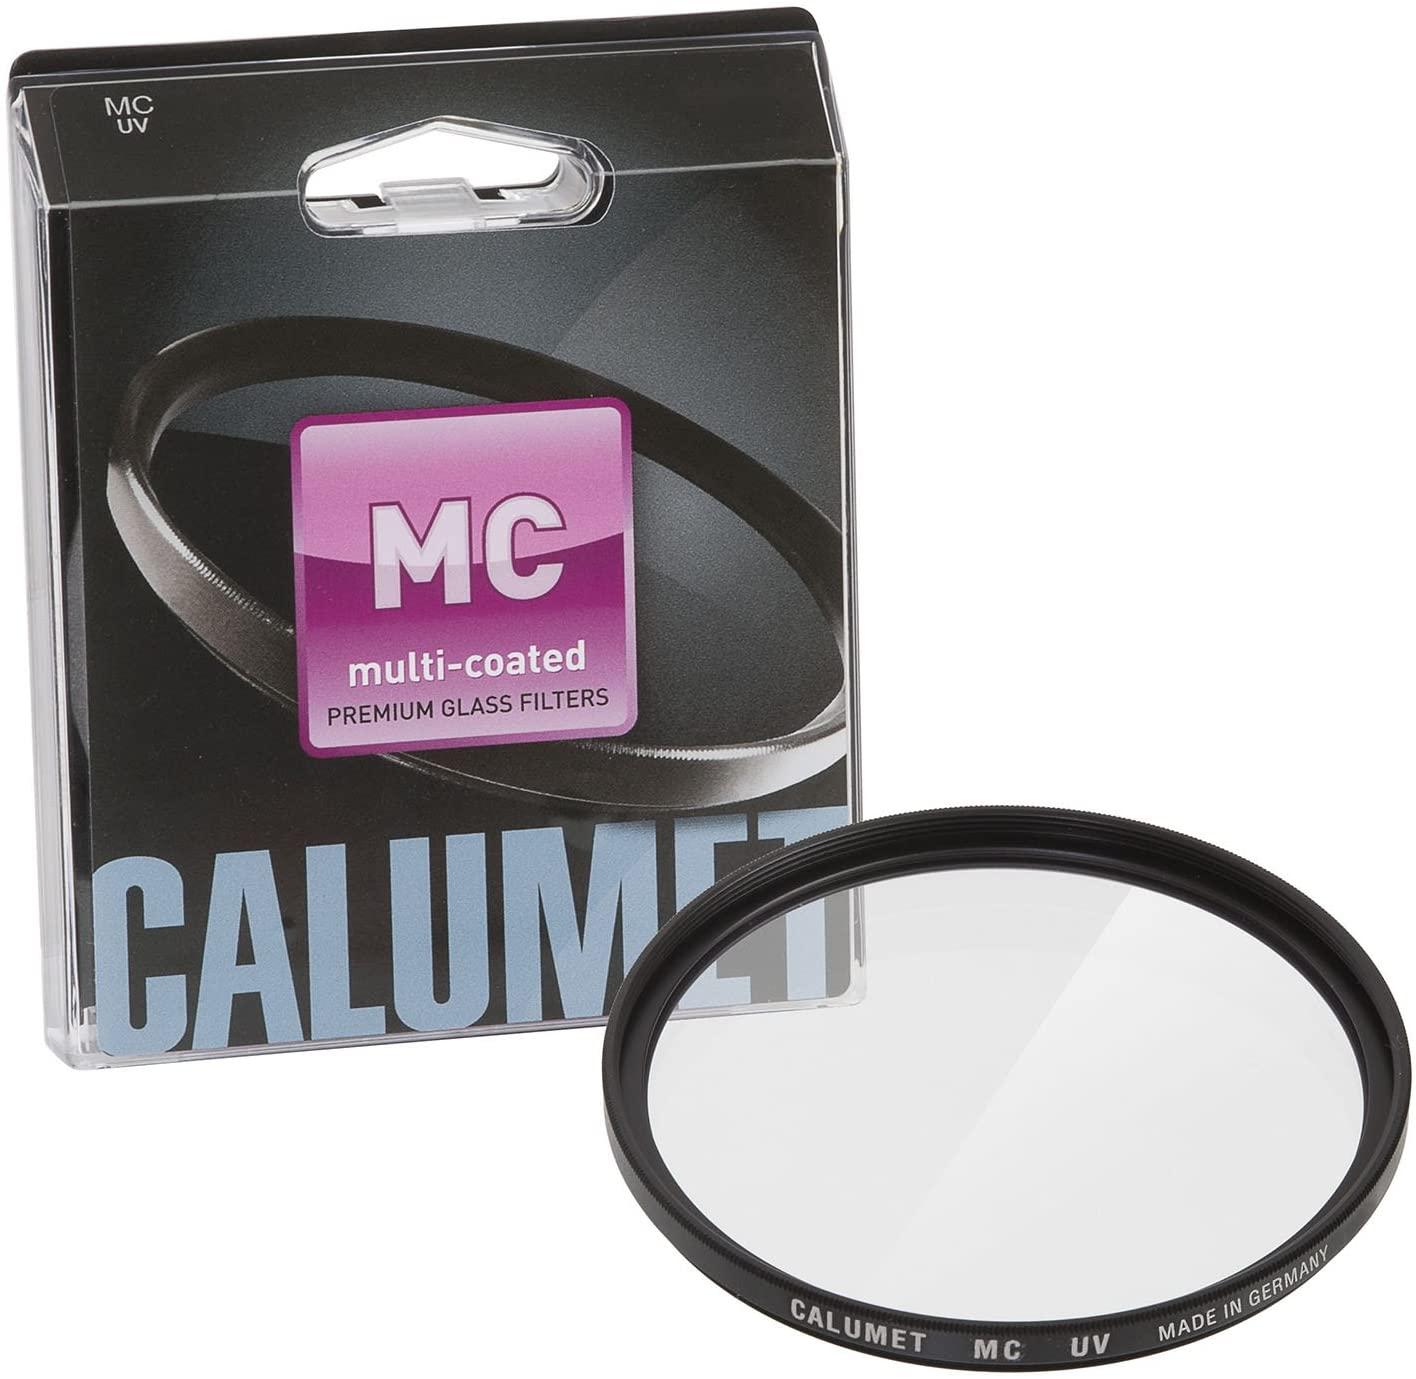 Calumet 62mm Multi-Coated Uv Filter.